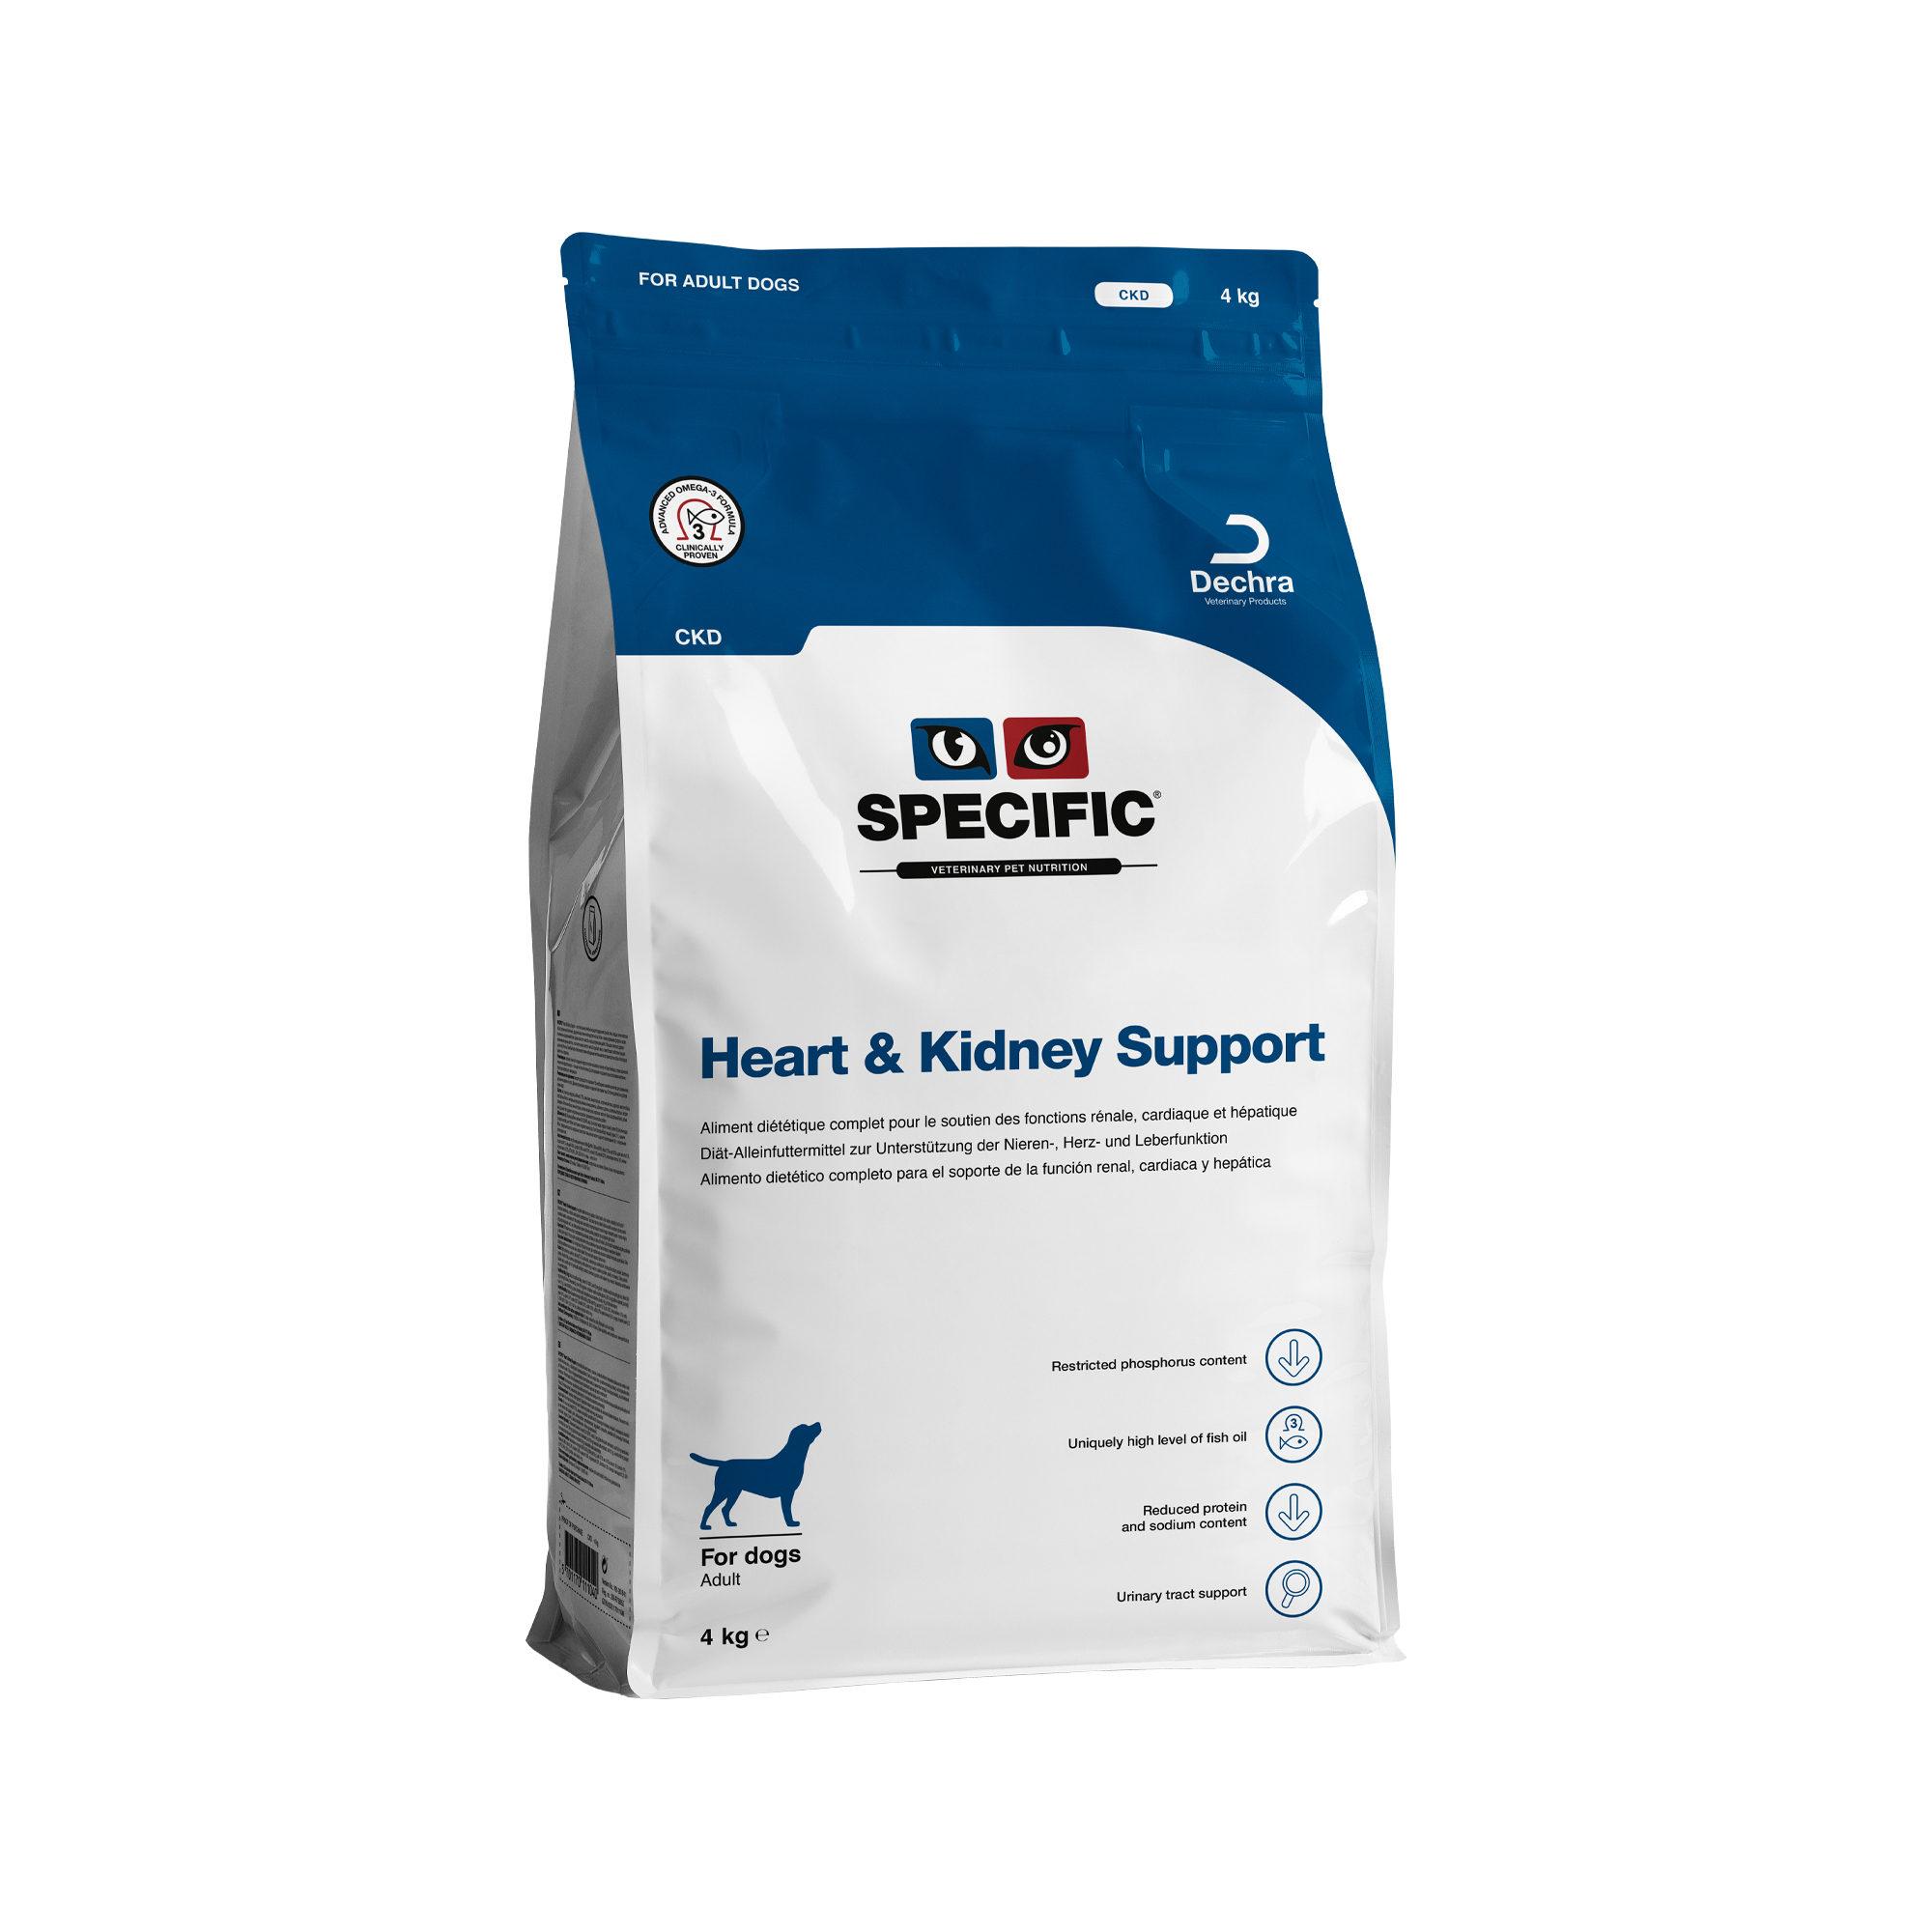 SPECIFIC Heart & Kidney Support CKD